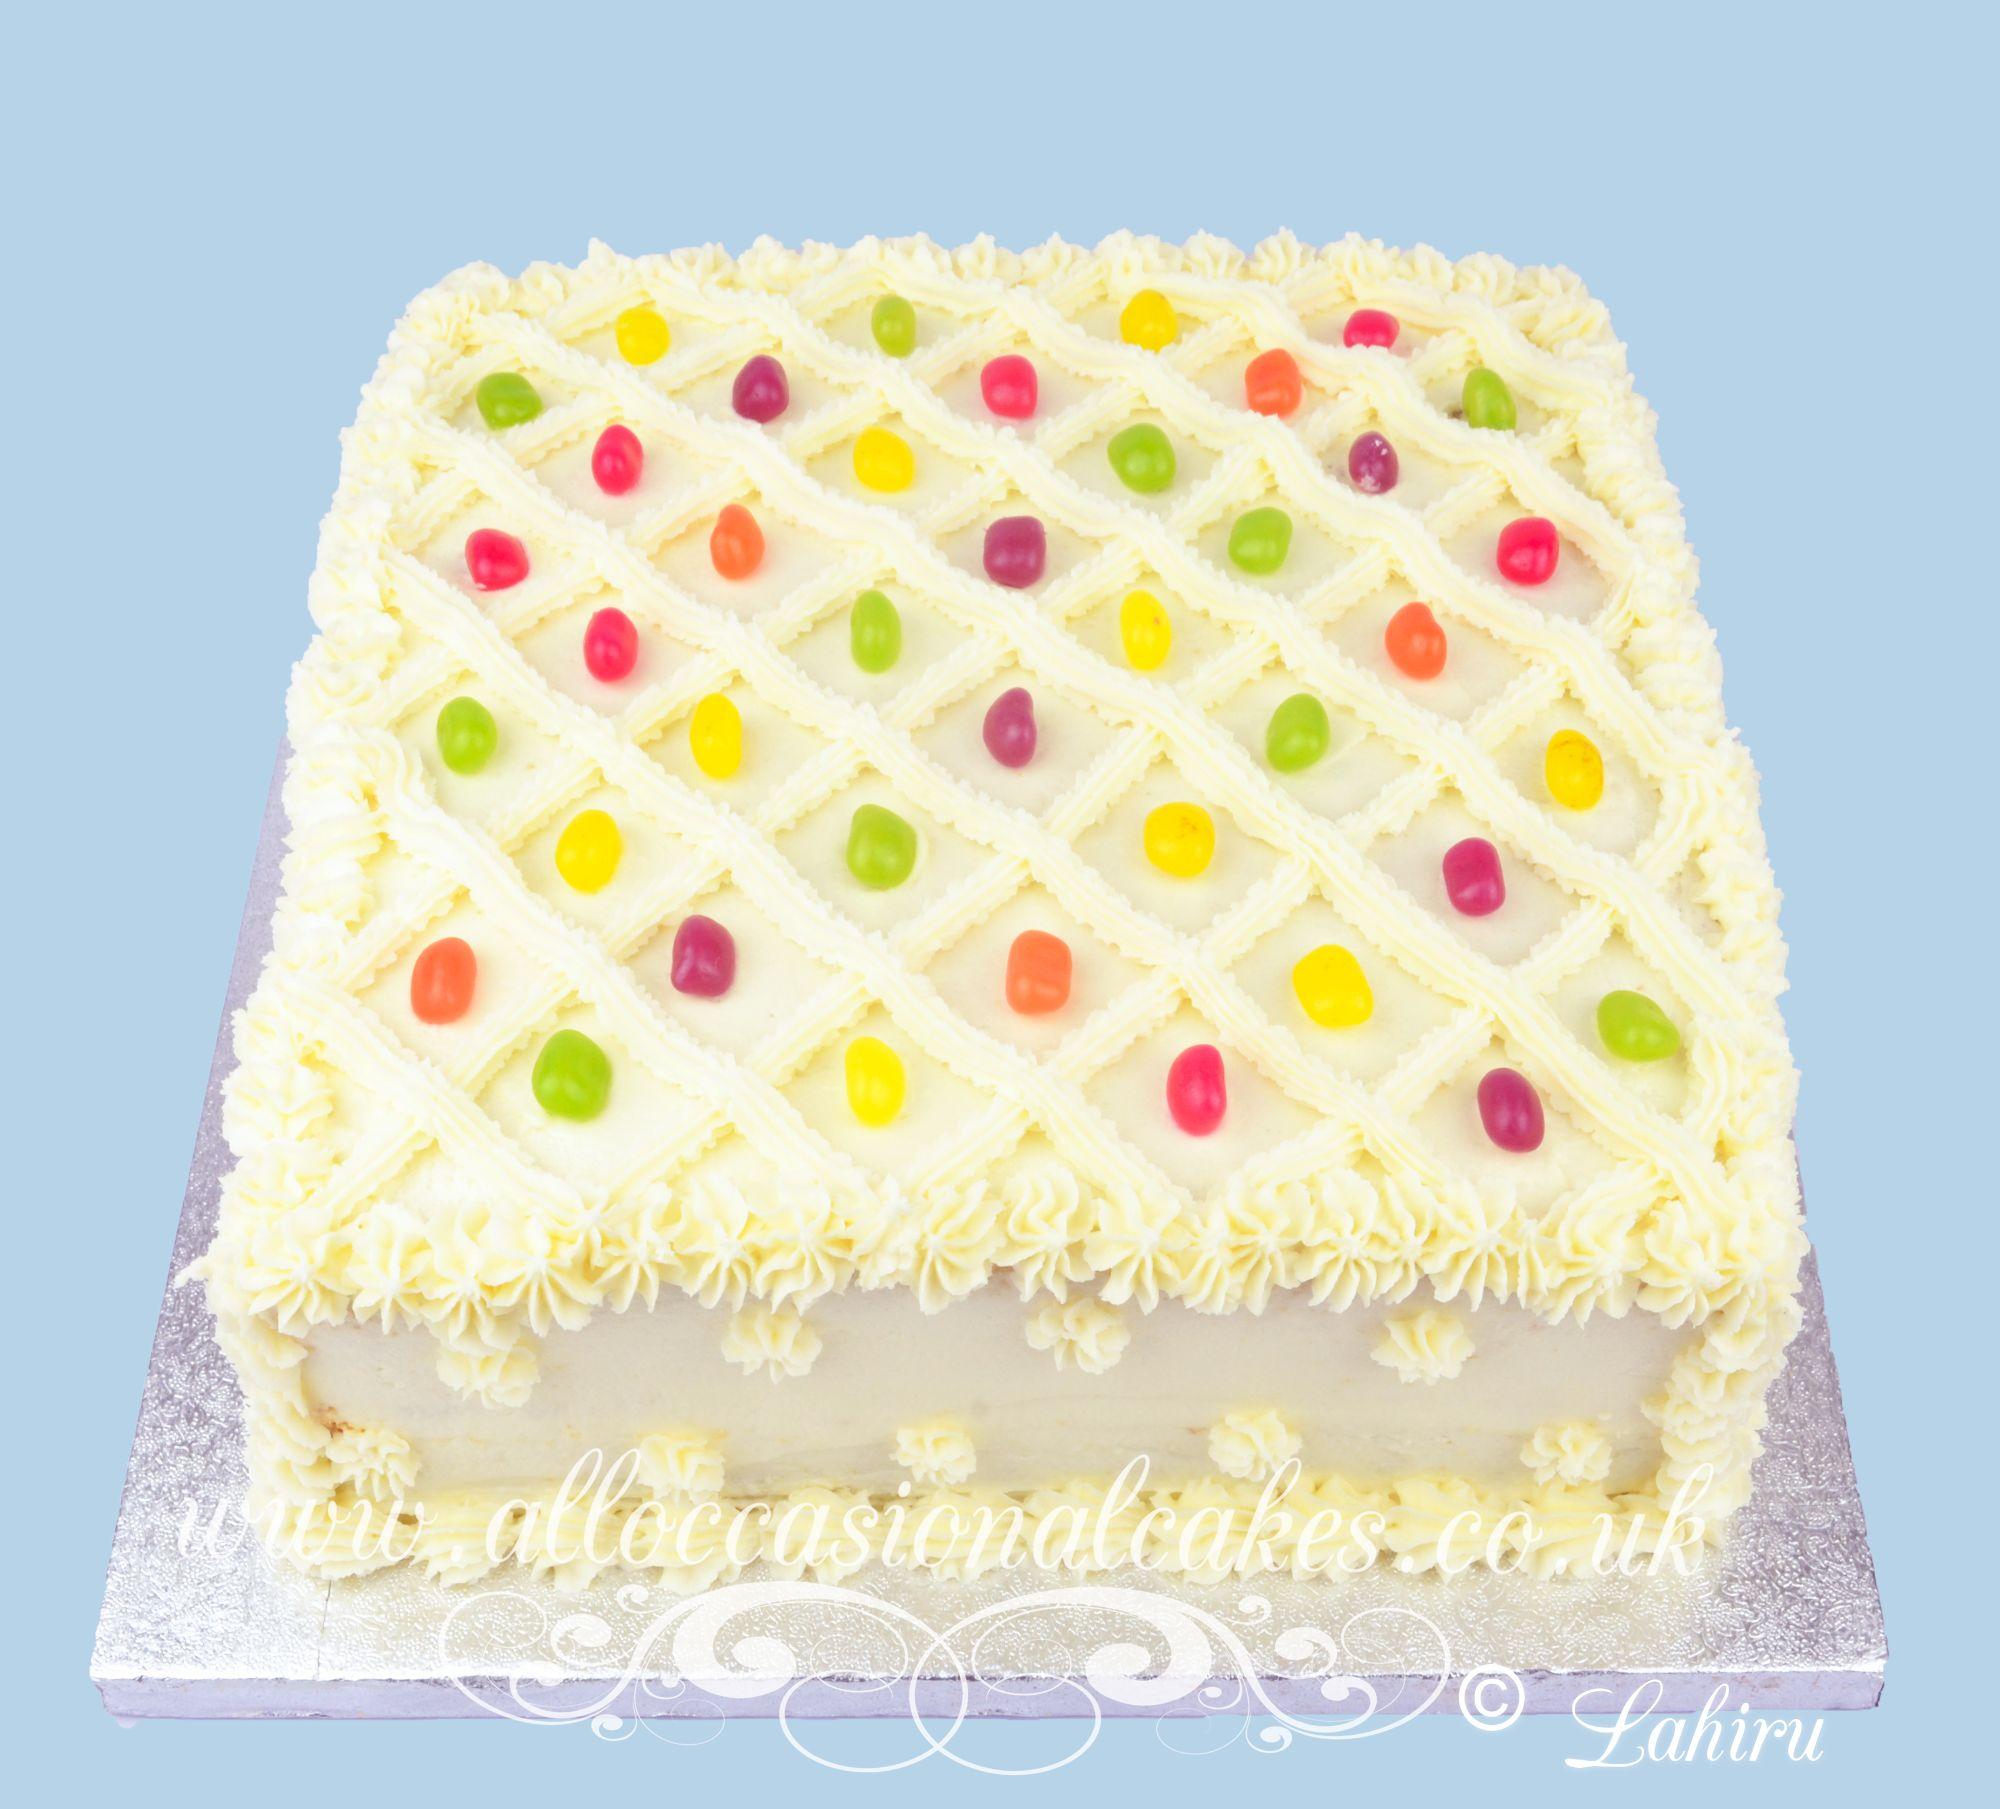 jelly bean design cake